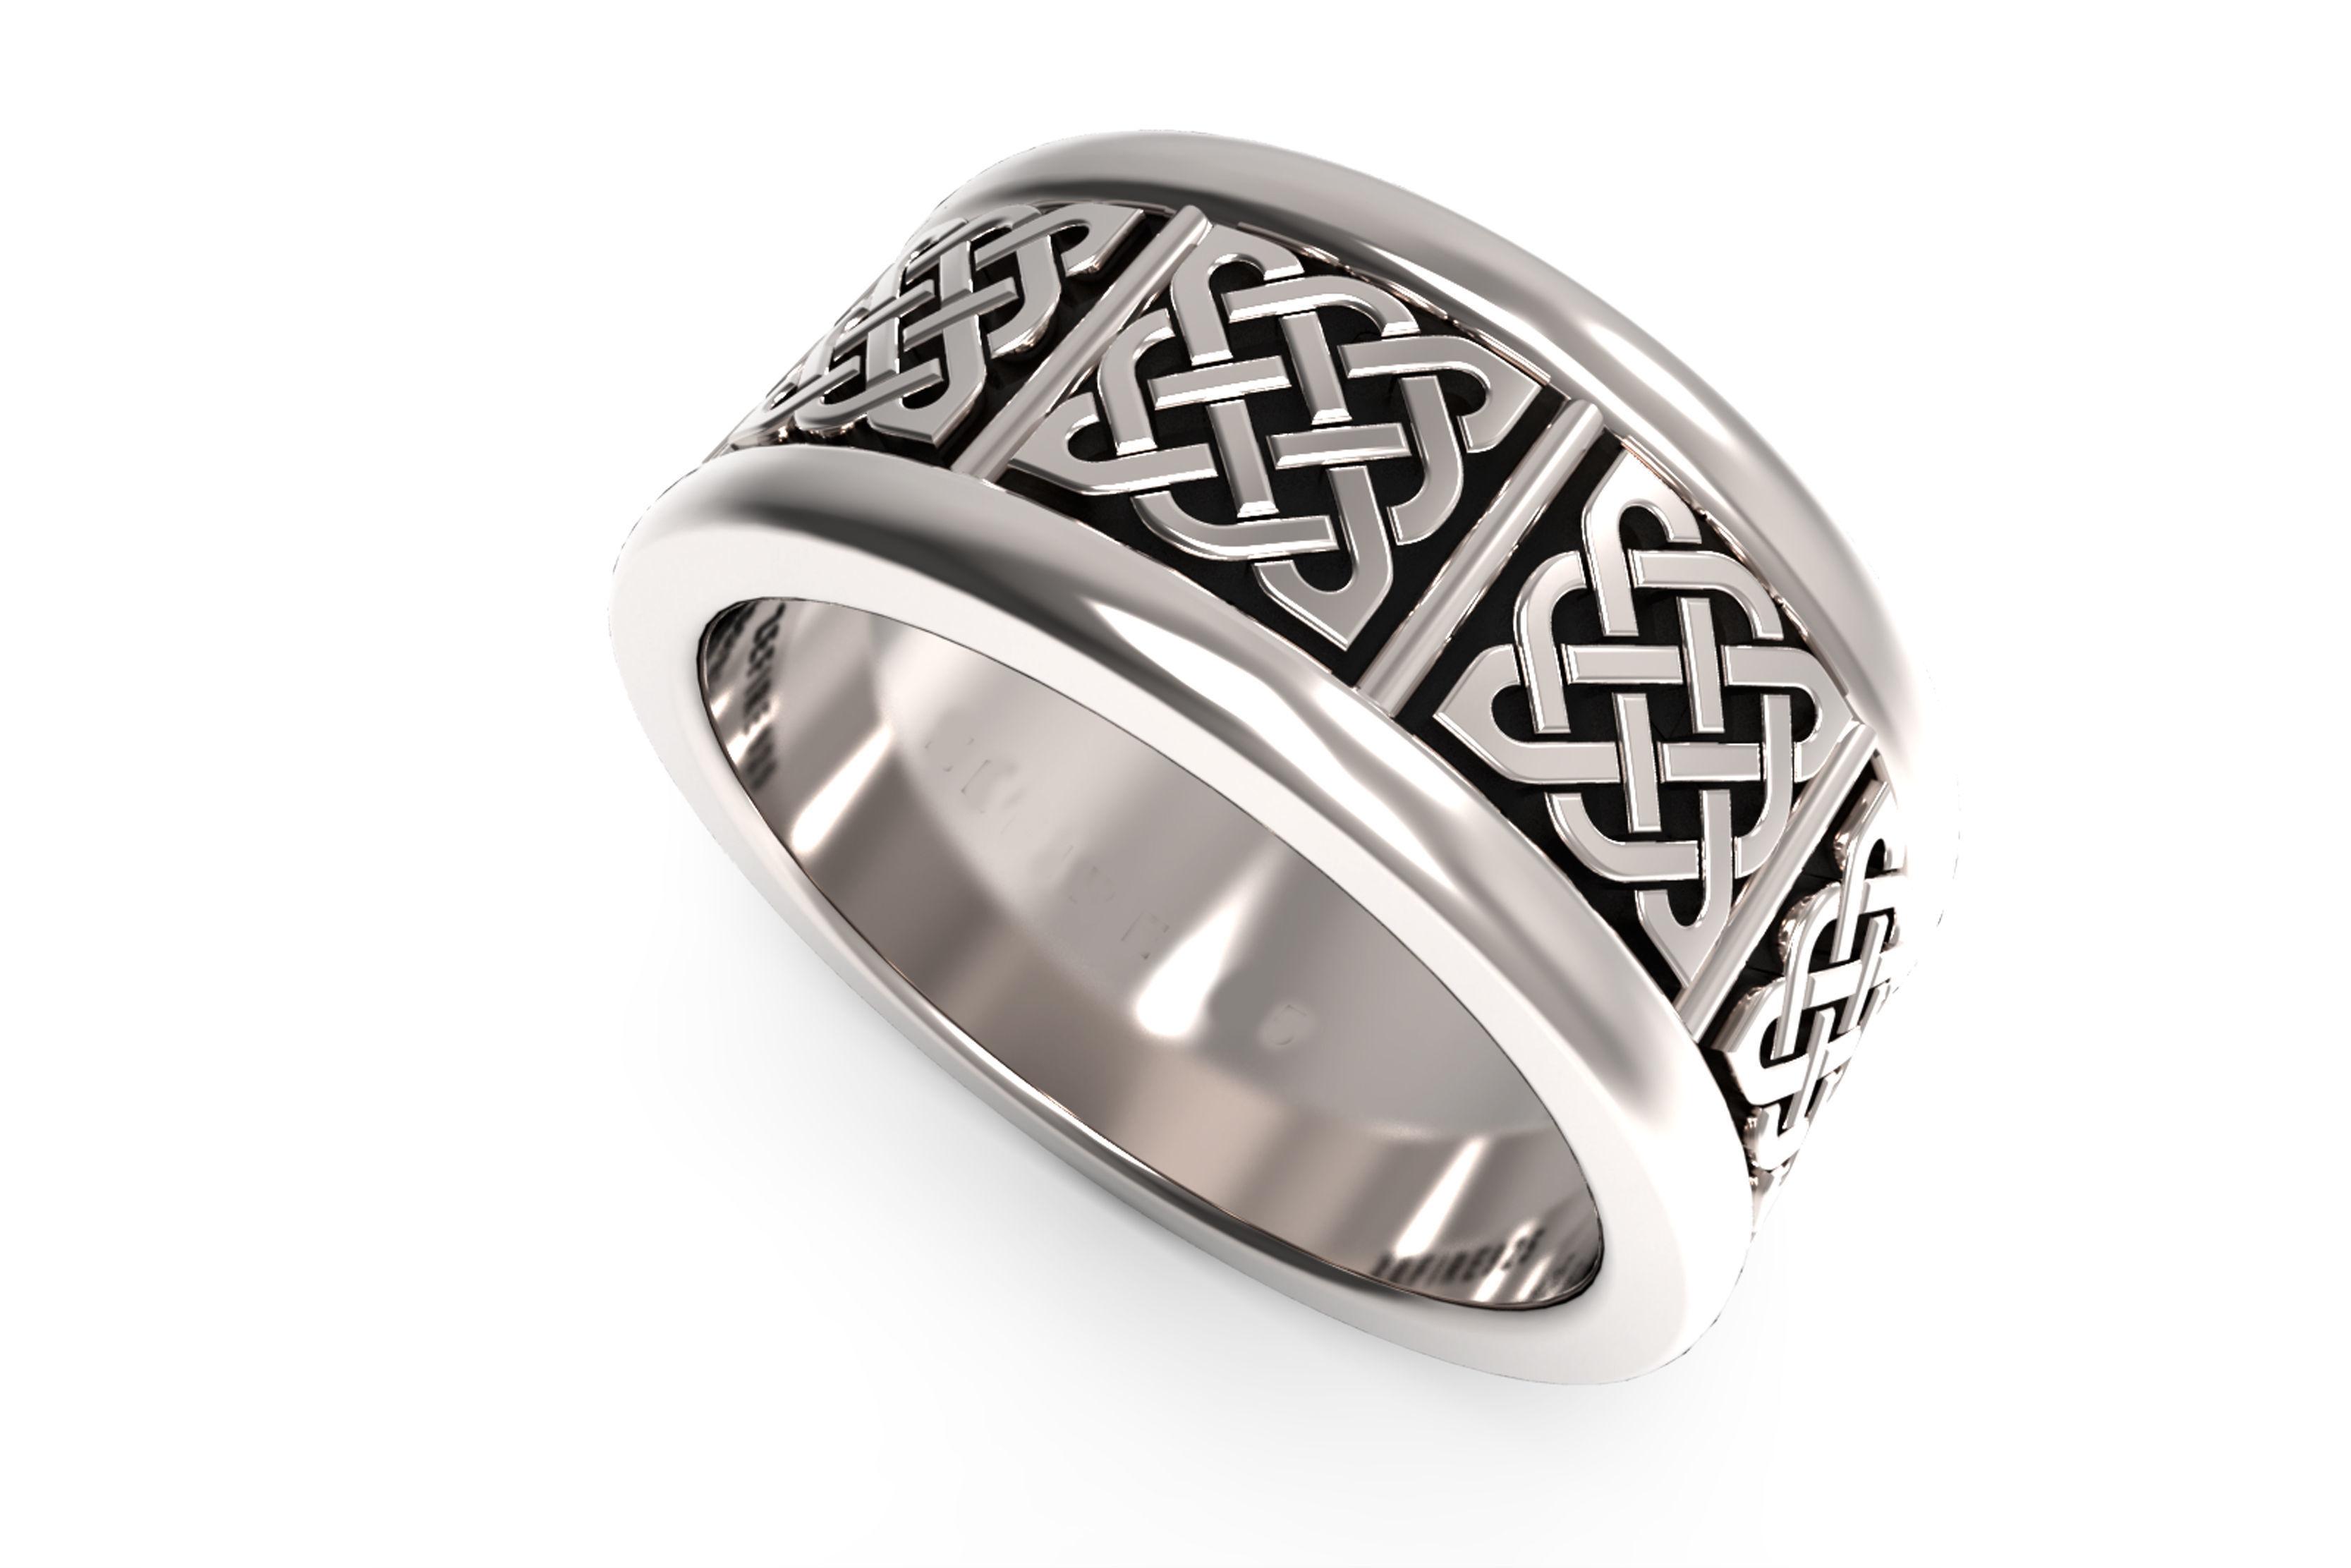 Celtic engagement ring stl file Celtic weddings Celtic